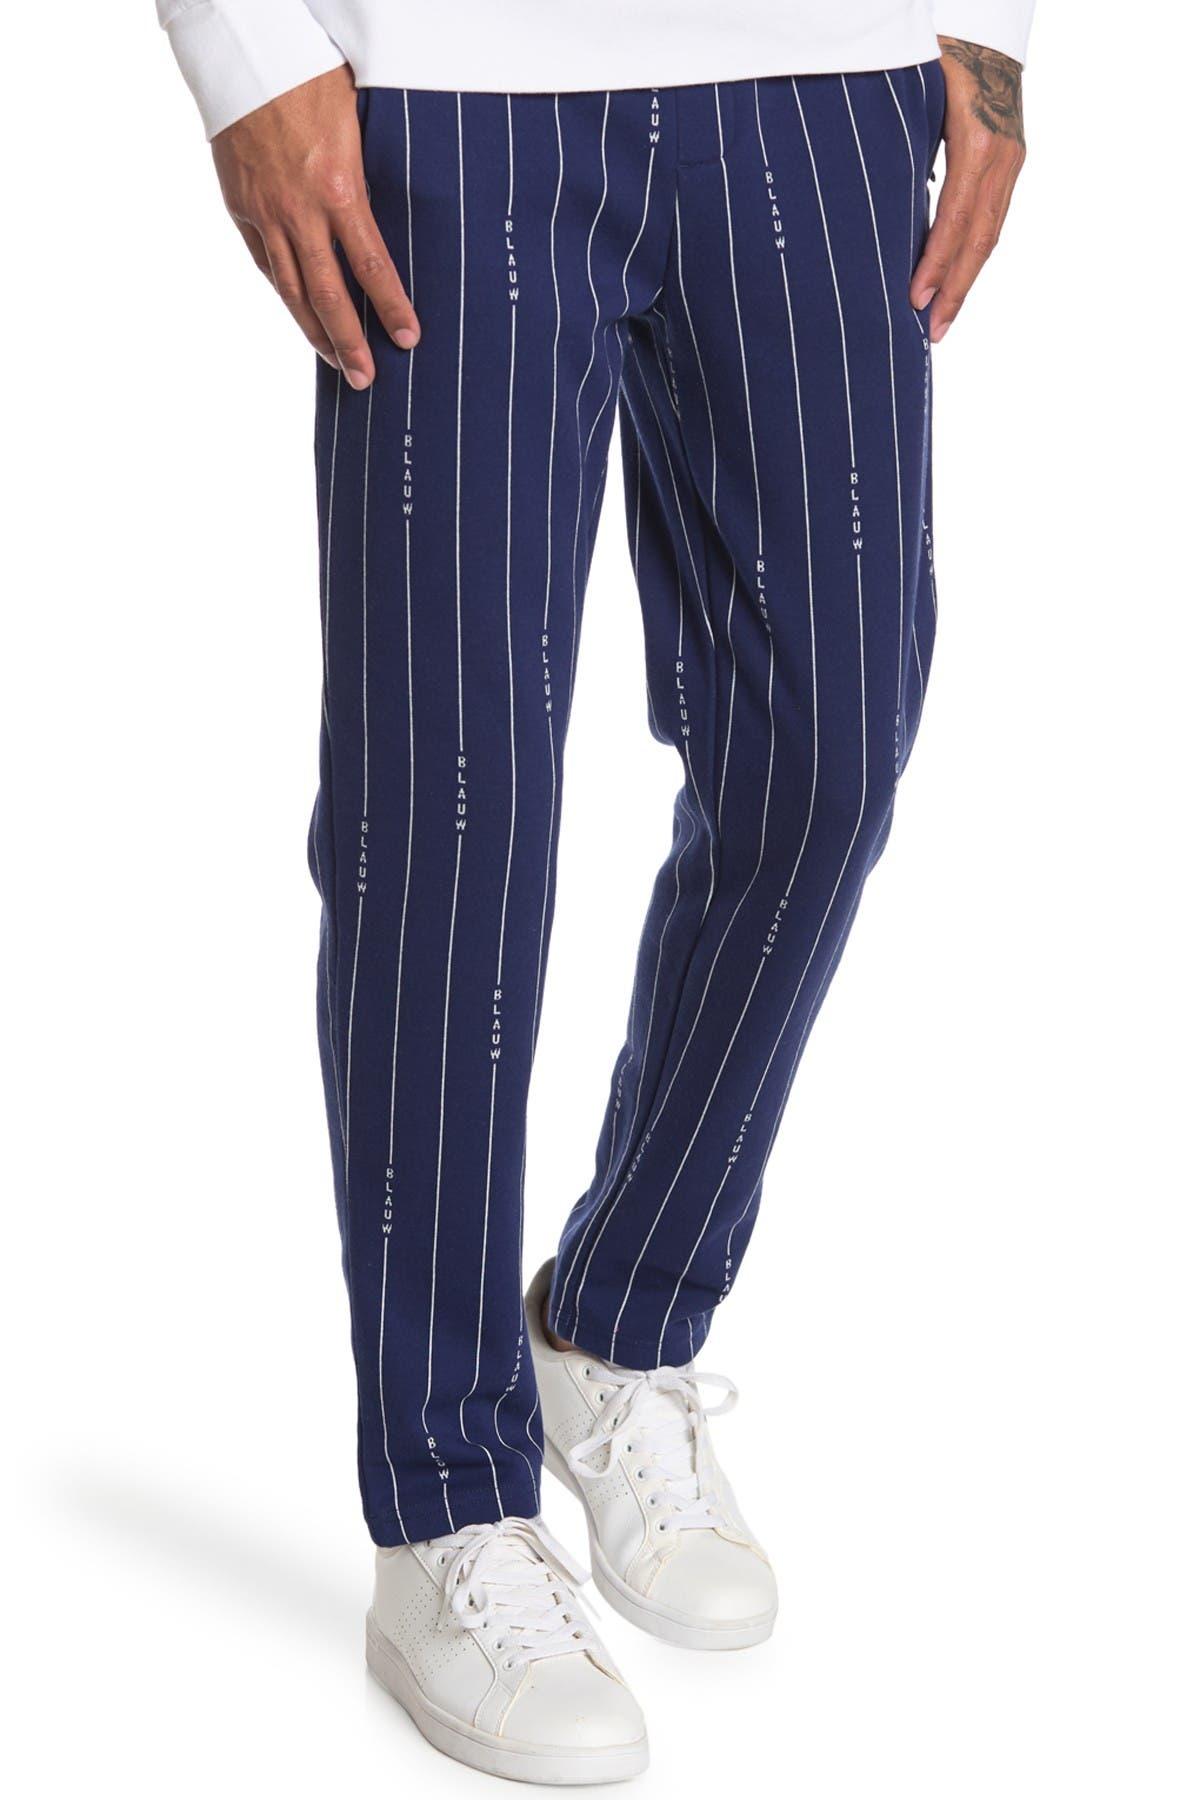 Image of Scotch & Soda Signature Pinstripe Print Sweatpants